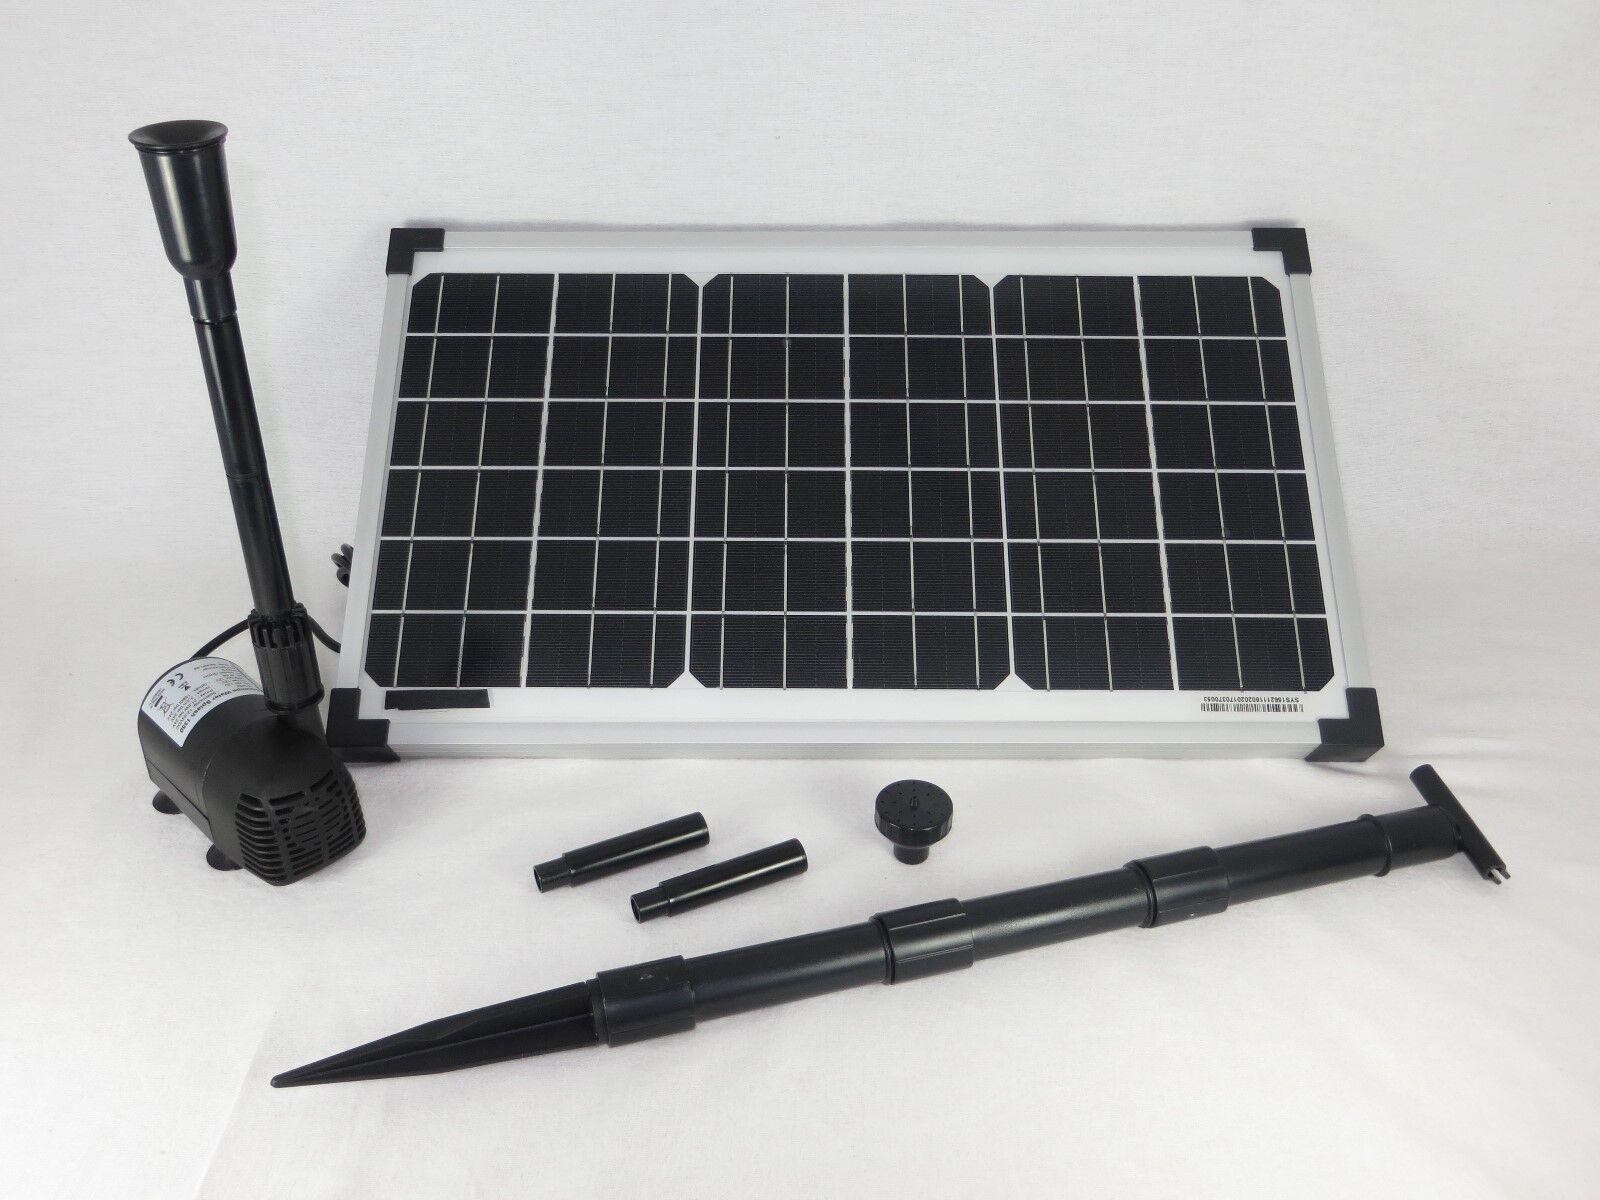 Solar pumpenset watersplash 1350 solar bomba bomba estanque sumergible bomba de jardín